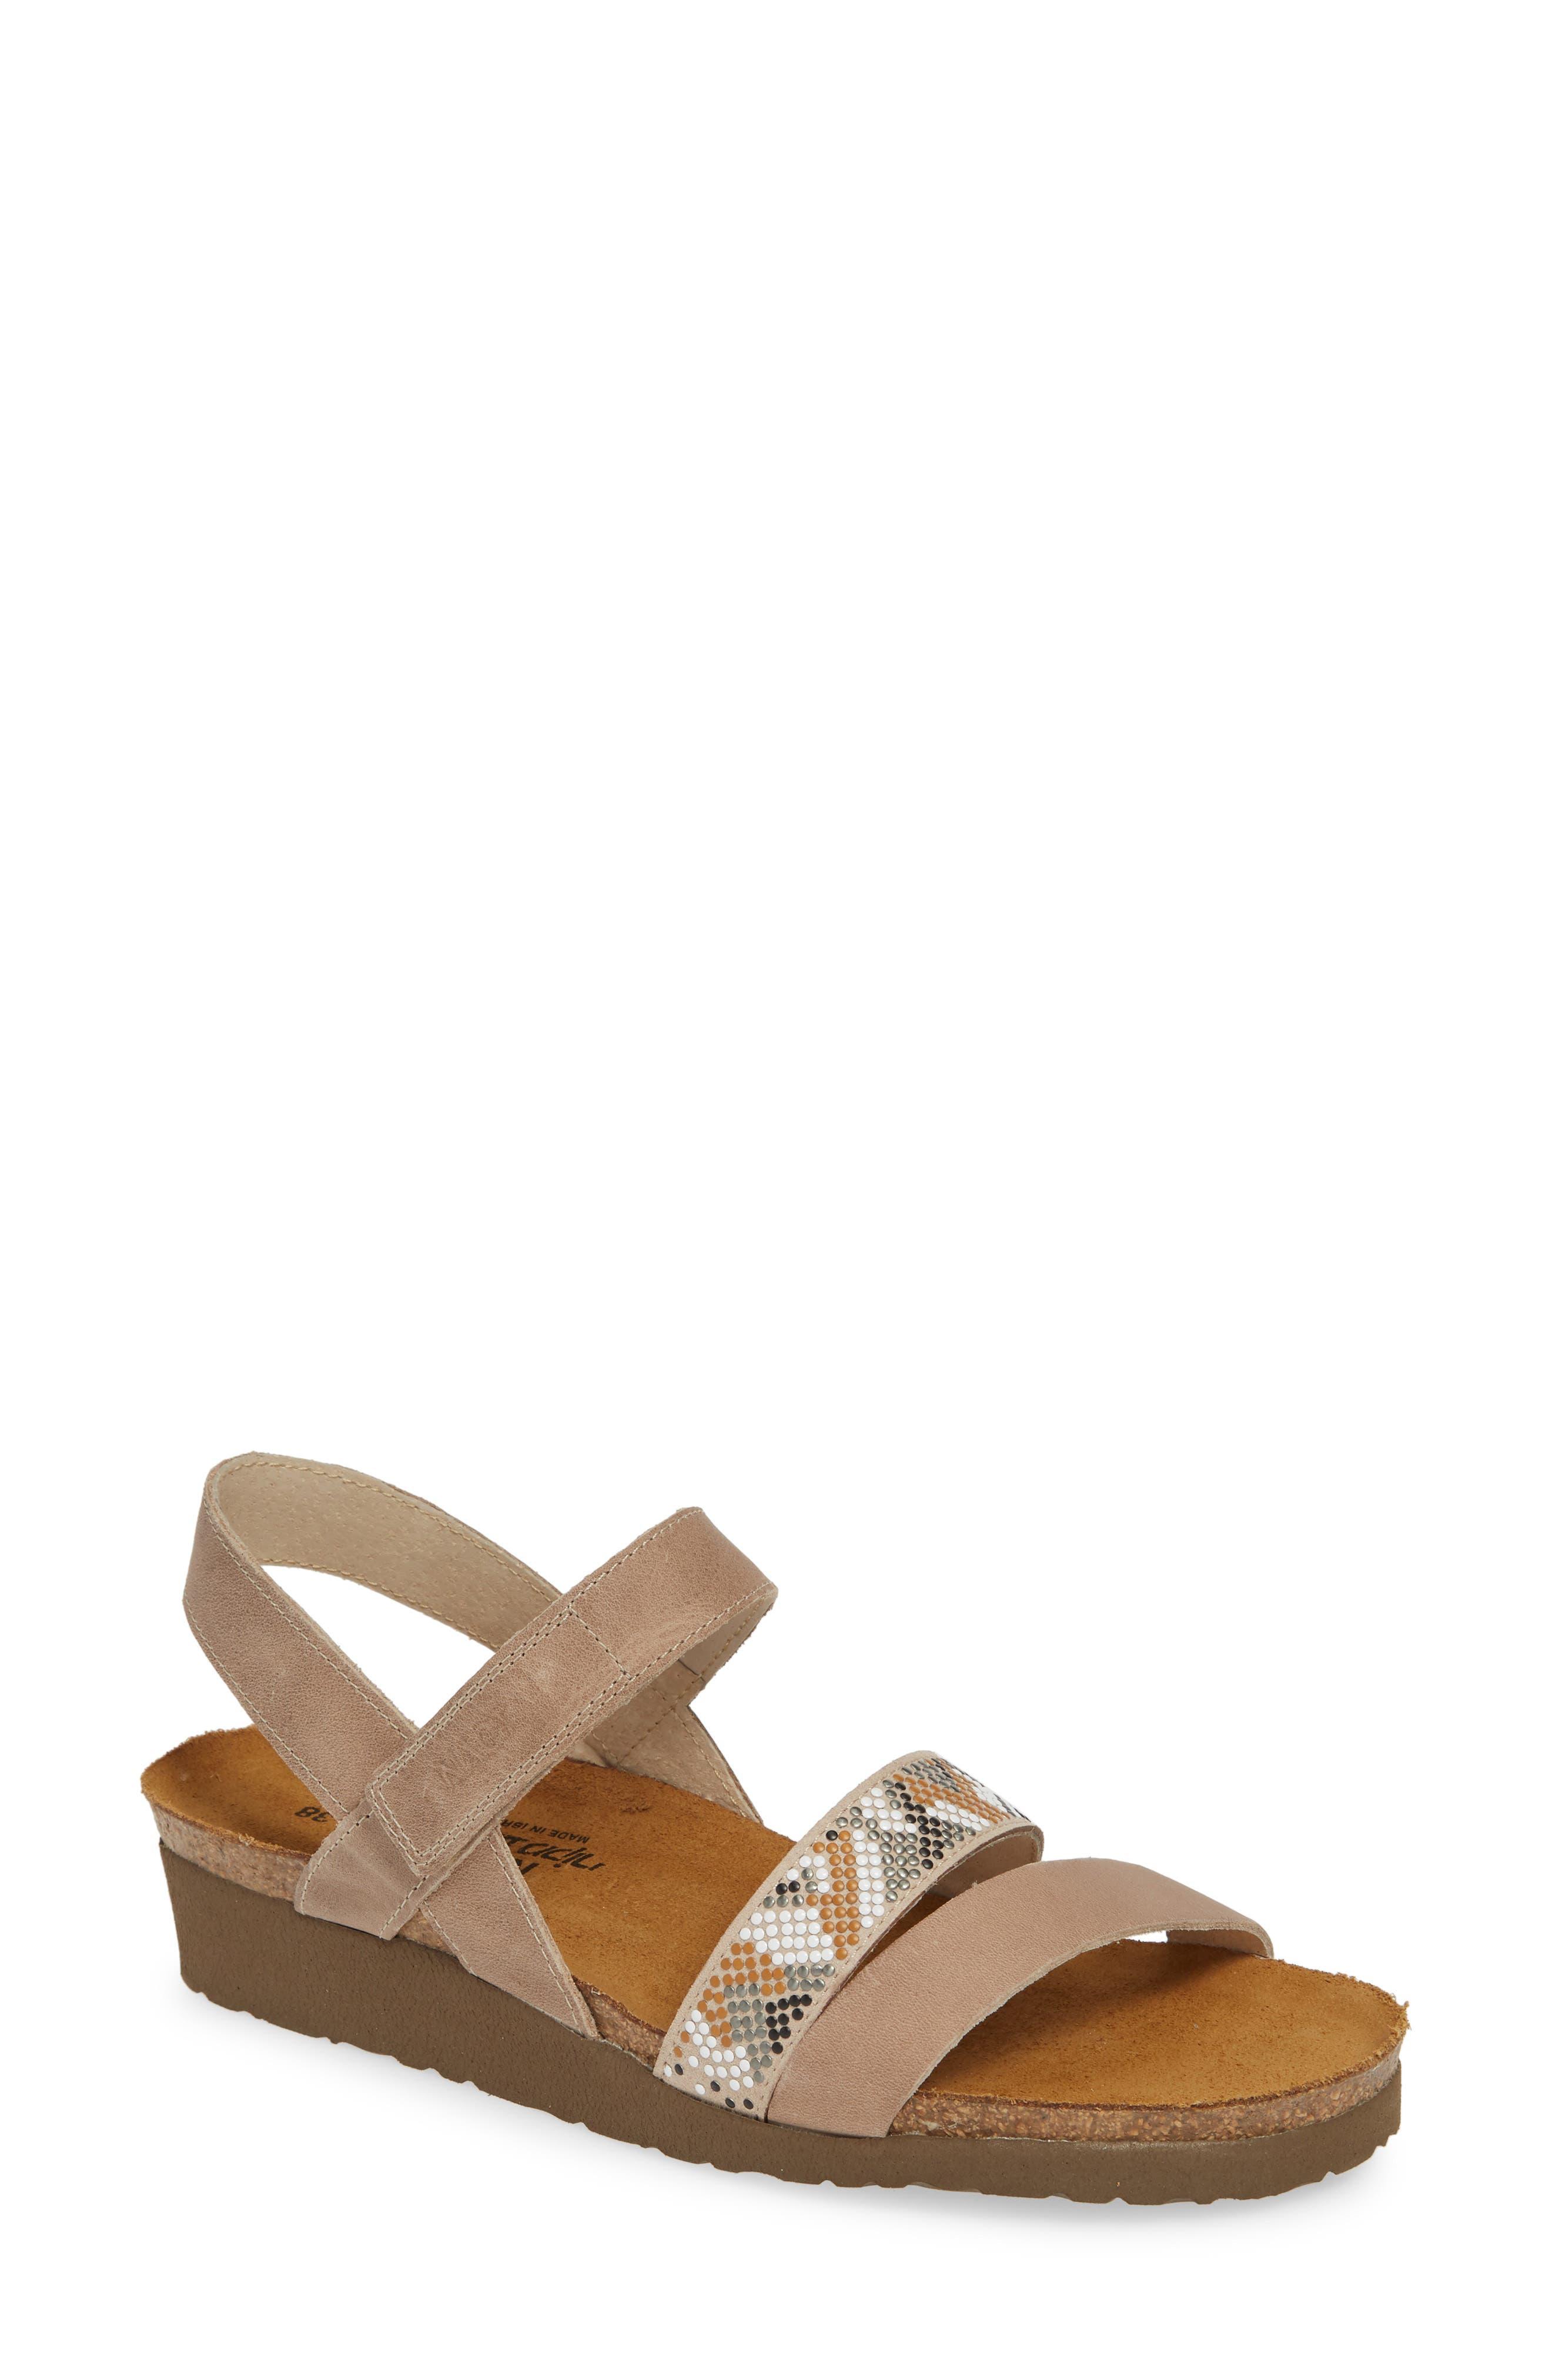 NAOT Gwyneth Sandal, Main, color, KHAKI BEIGE